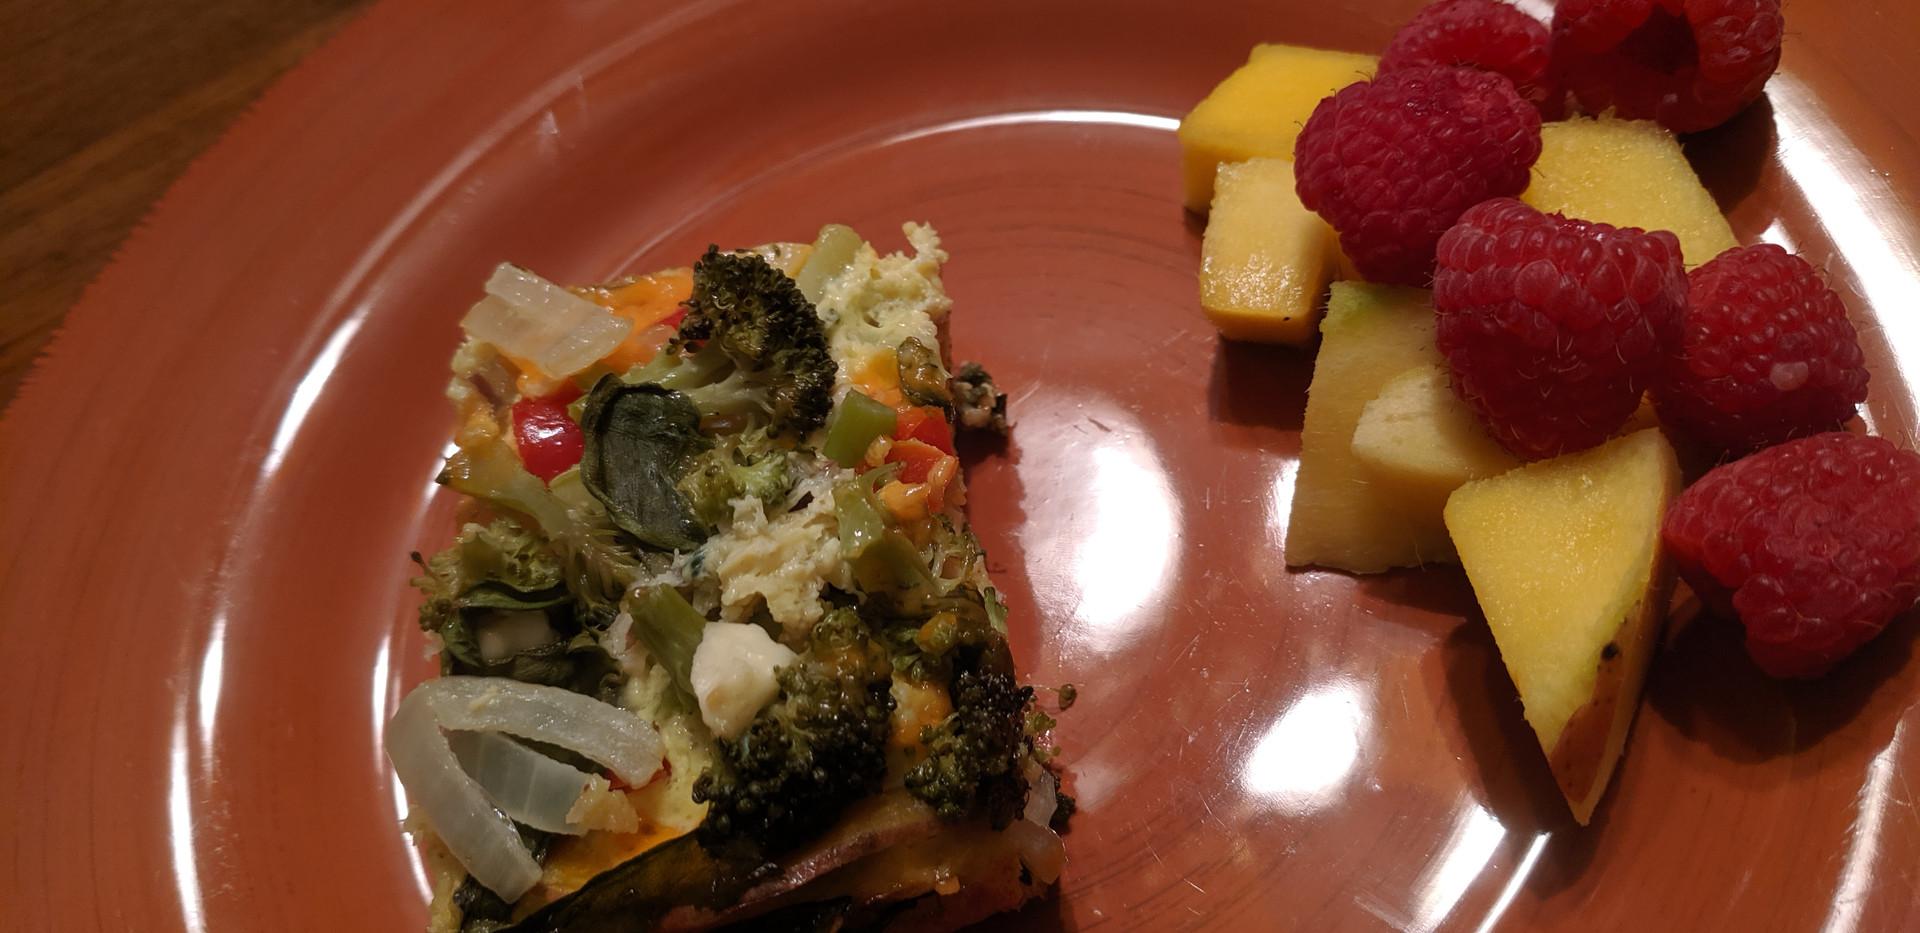 breakfast option of frittata and fruit